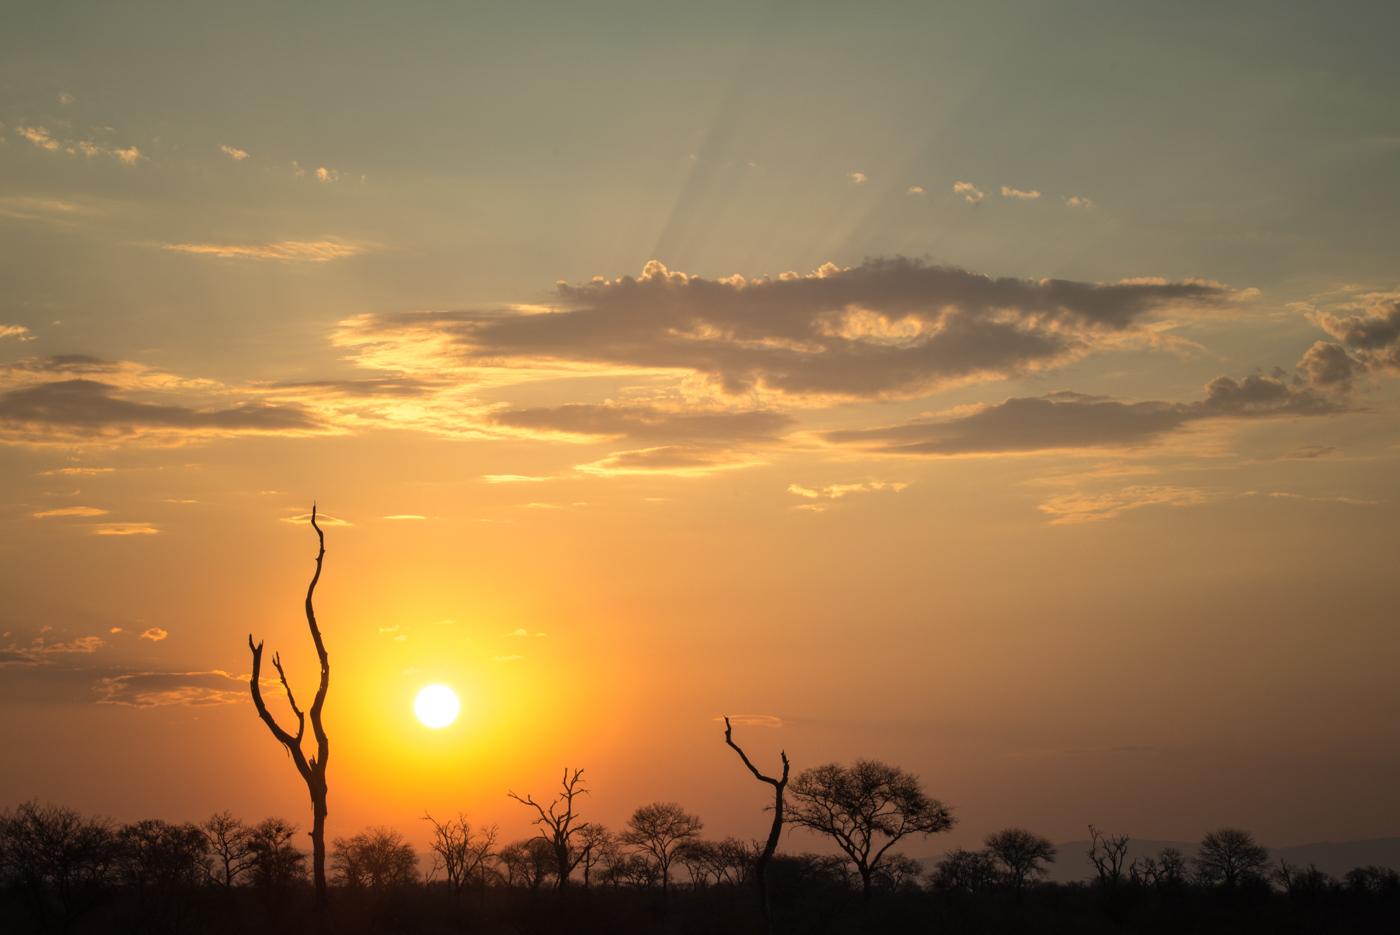 sunset, SC